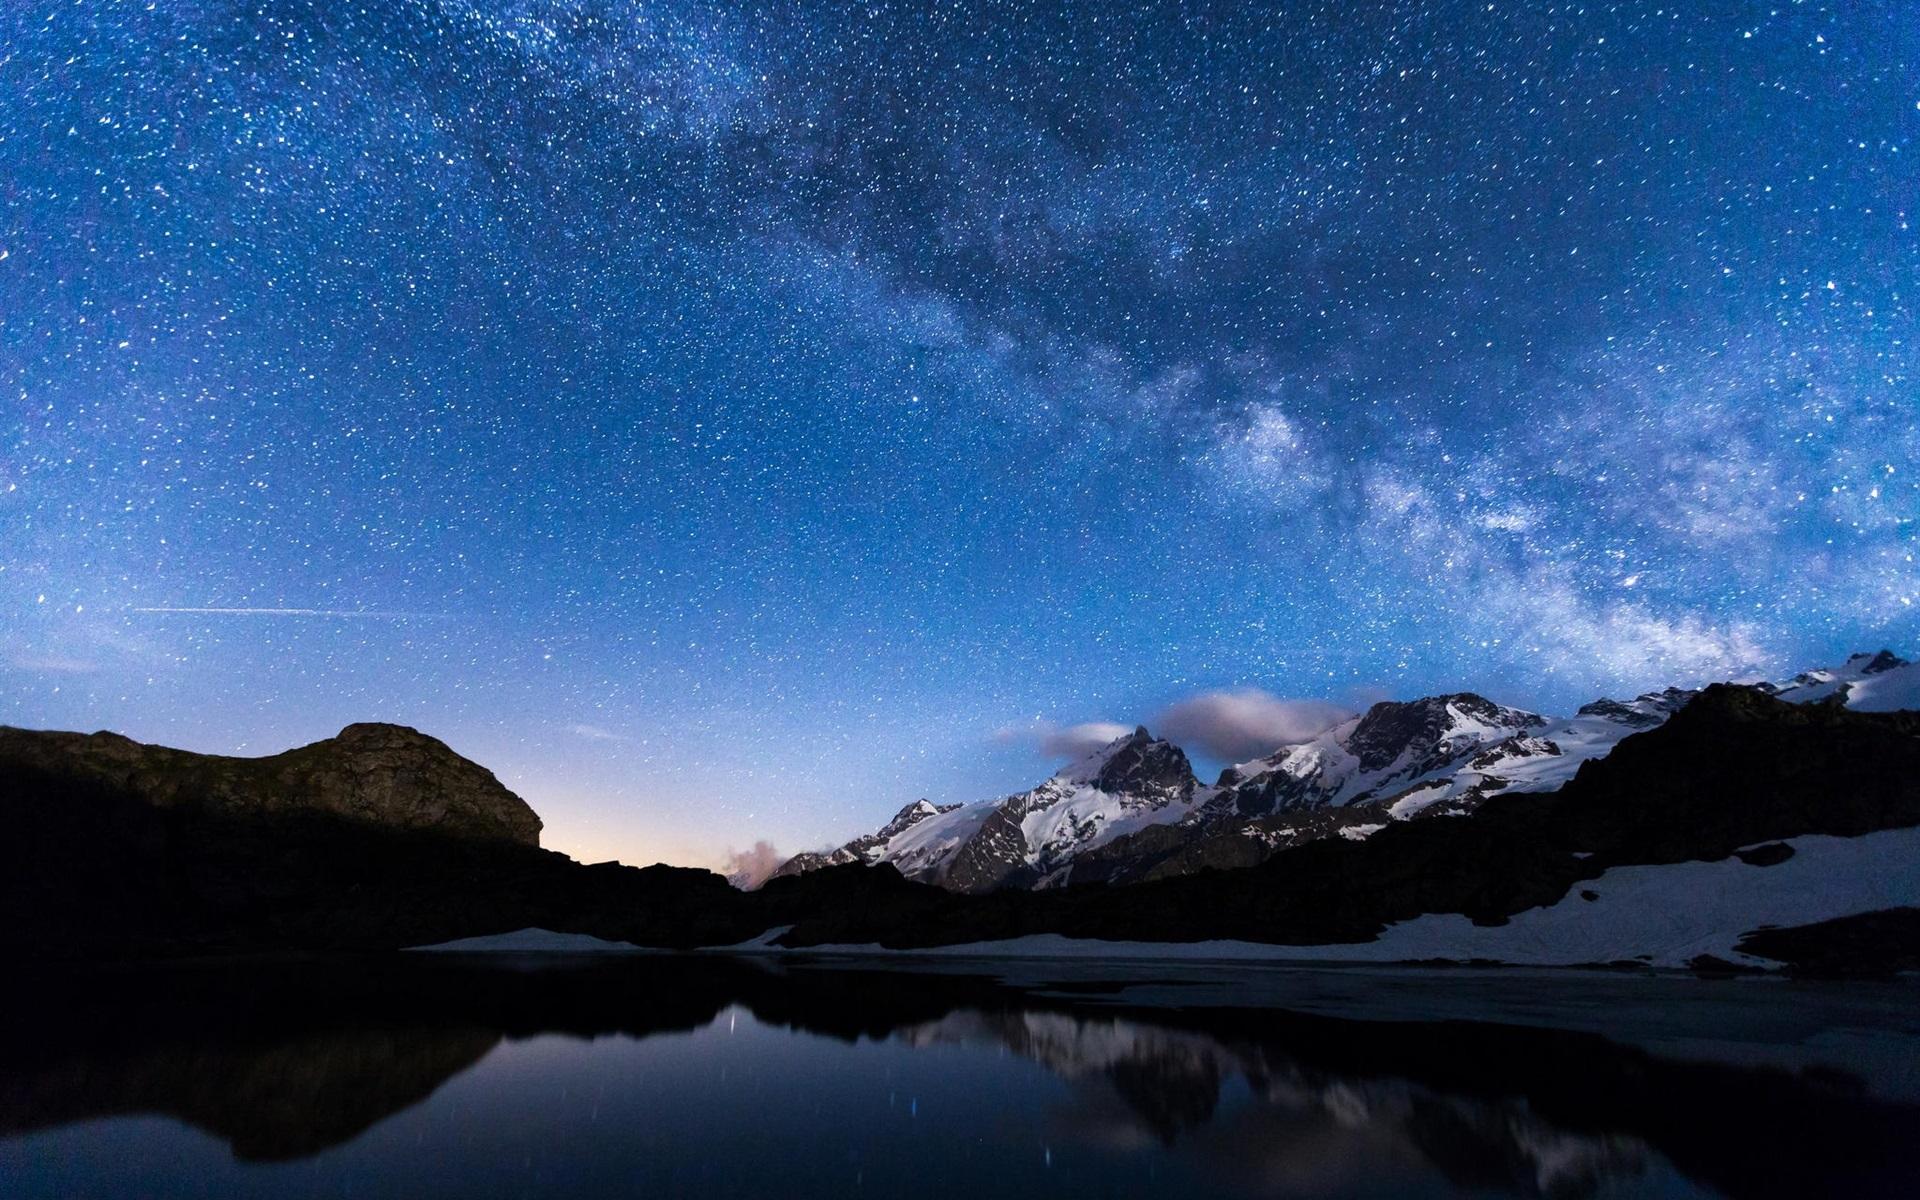 Pin Fondos Montana Nevada 1440x900 Widescreen Wallpapers: Wallpaper Night, Lake, Mountains, Sky, Stars, Water